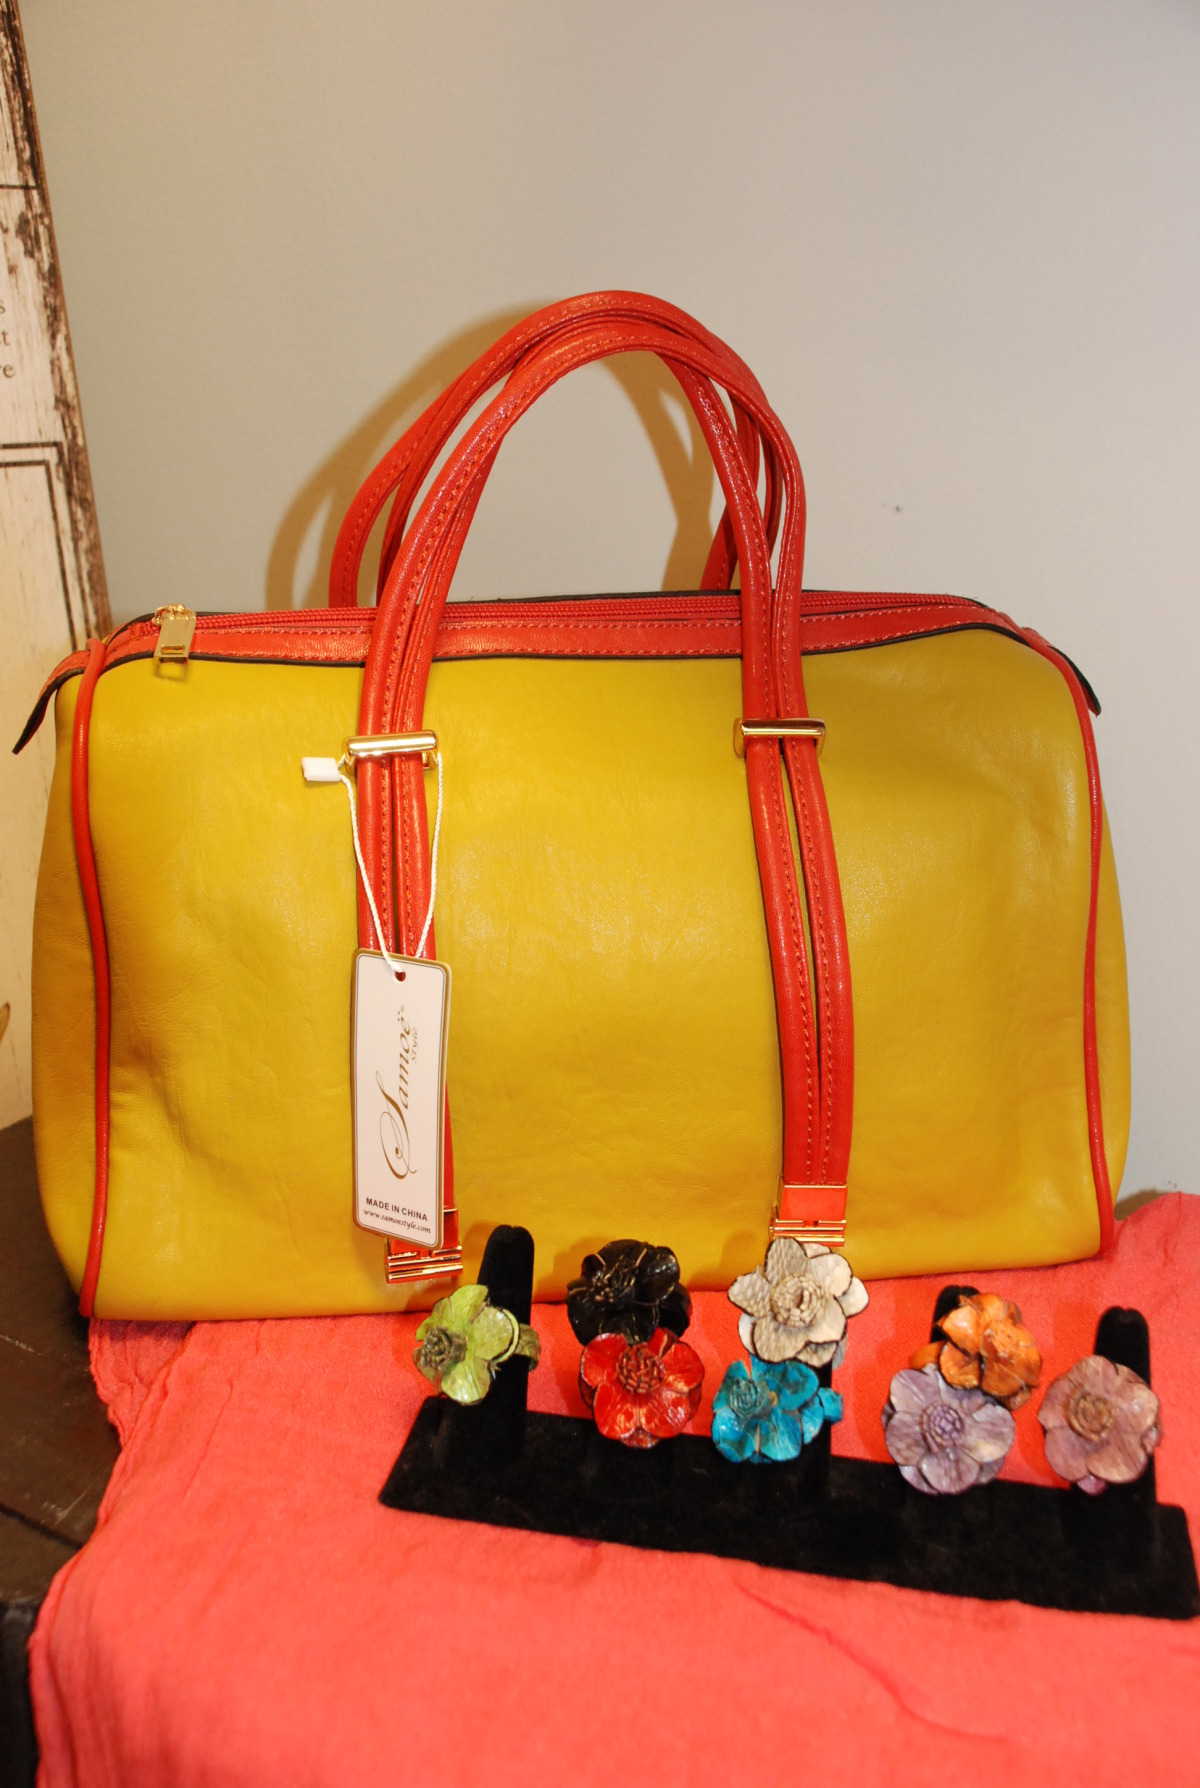 samoe handbag with adjustable straps.jpg